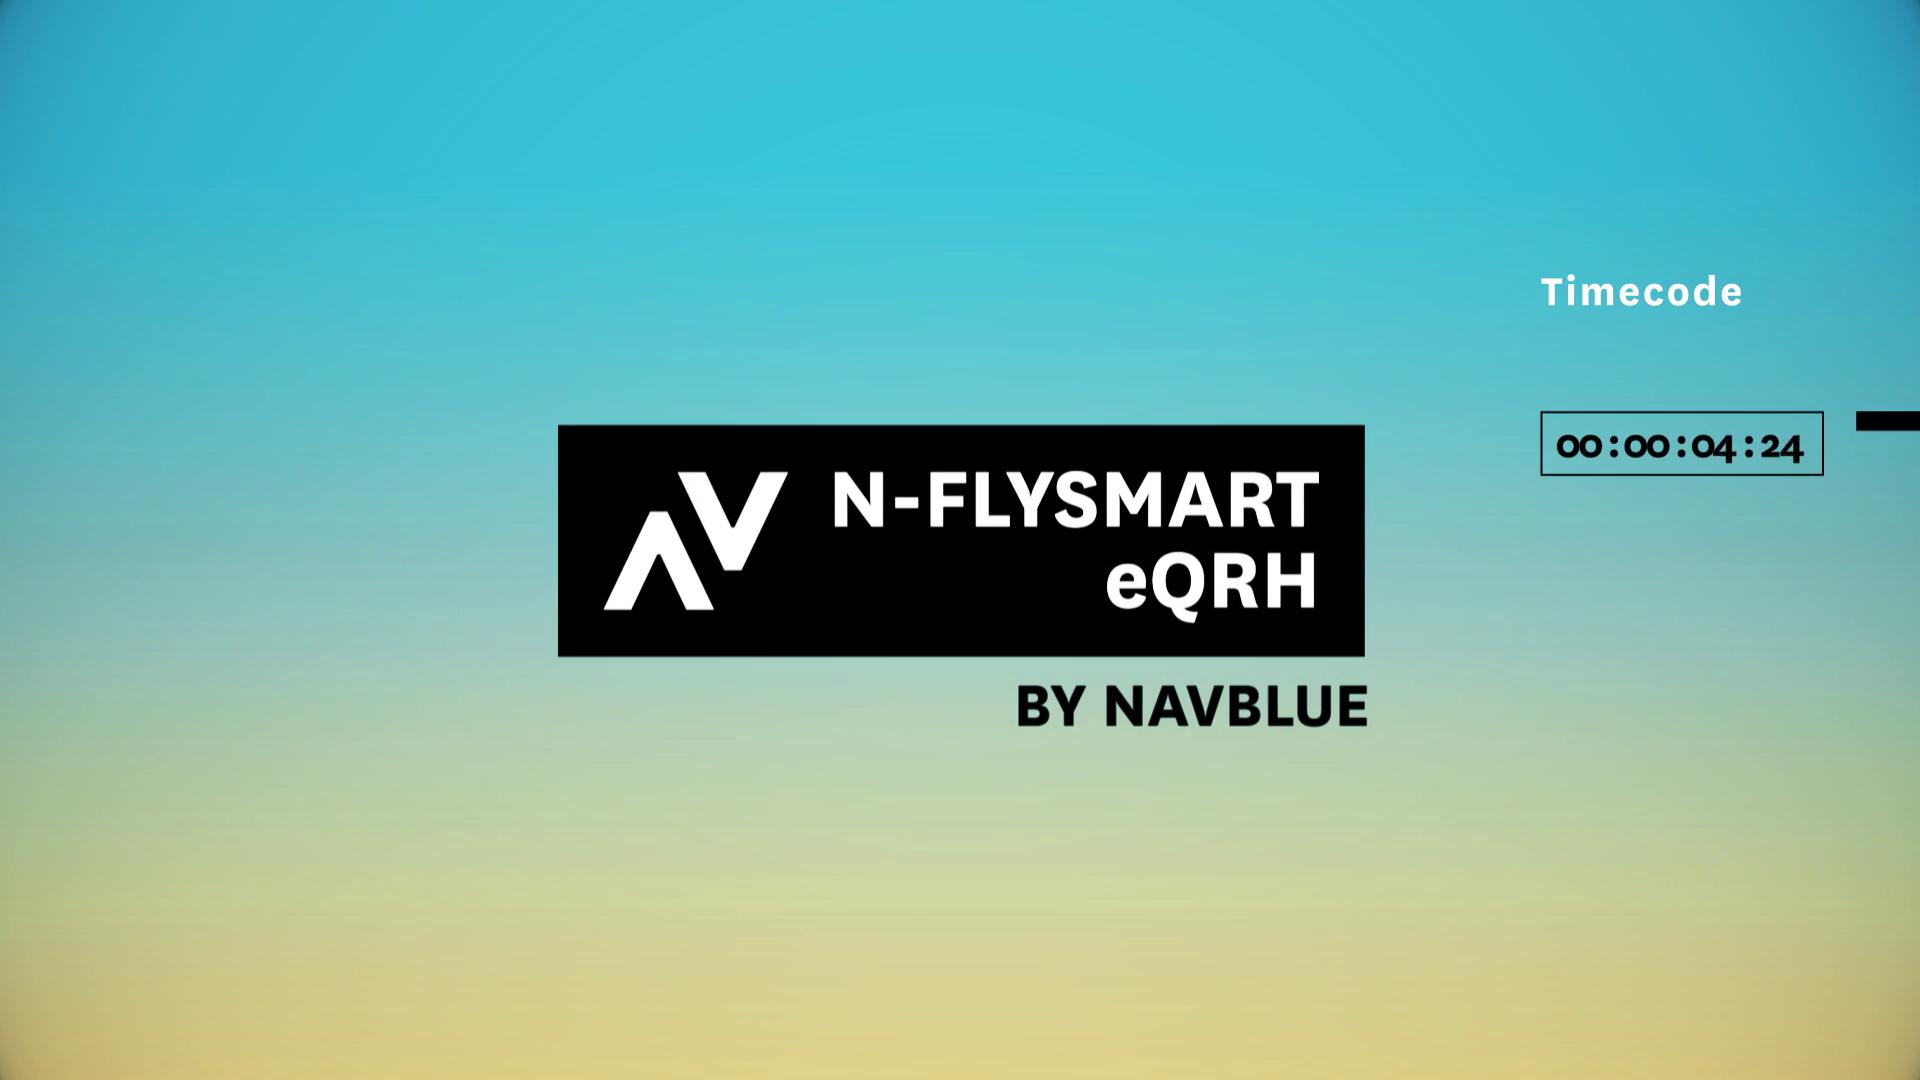 NAVBLUE NFlysmart eQRH